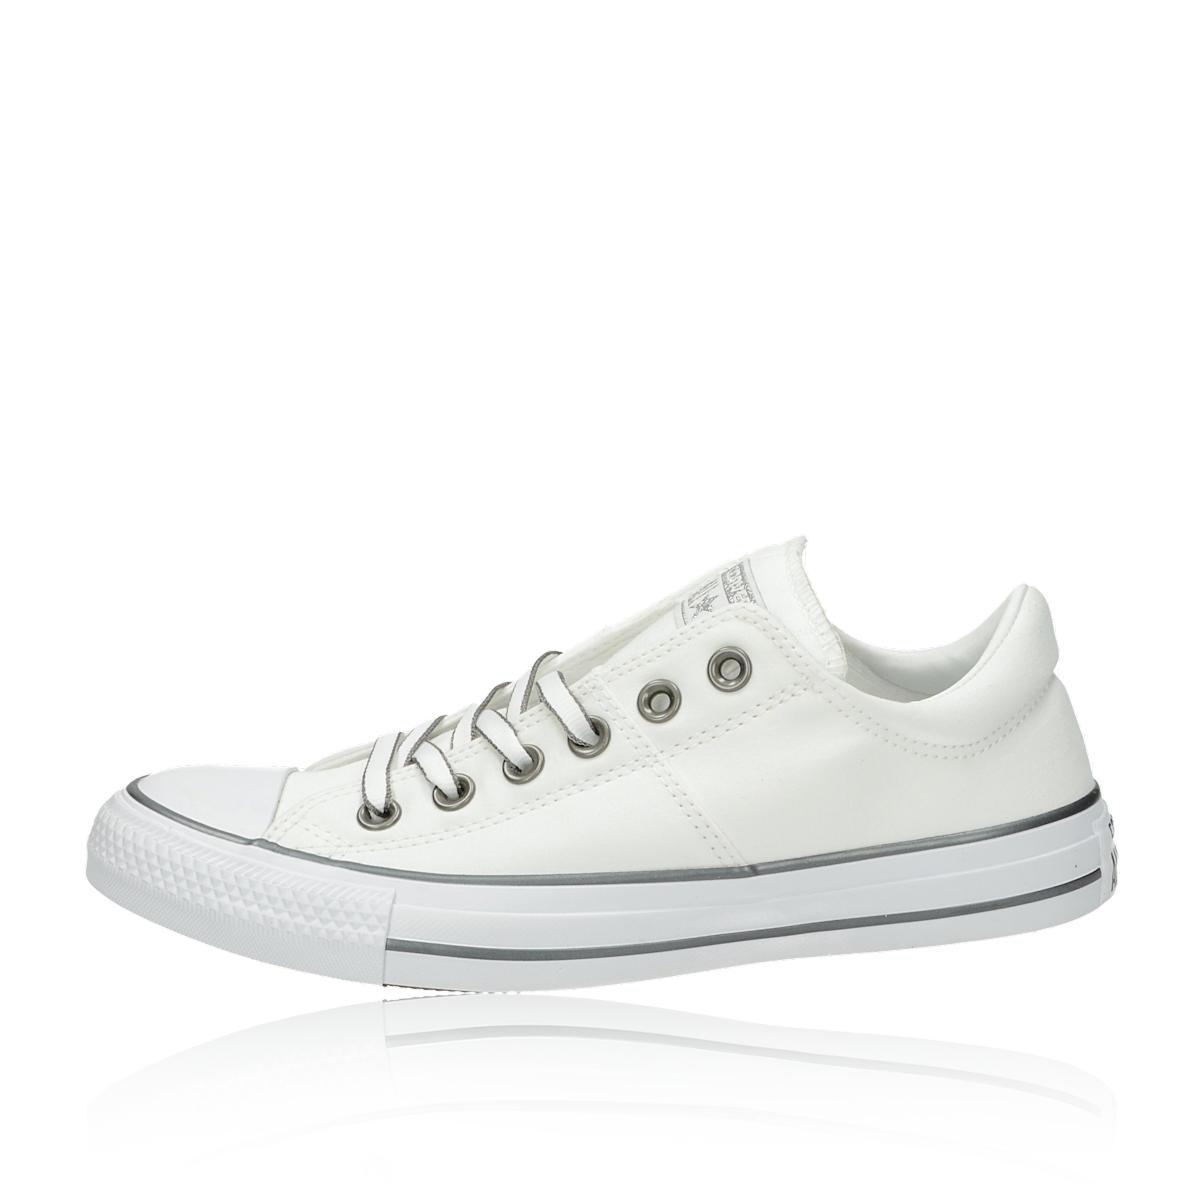 Converse dámske textilné tenisky - biele Converse dámske textilné tenisky -  biele ... 8382ed7bd7